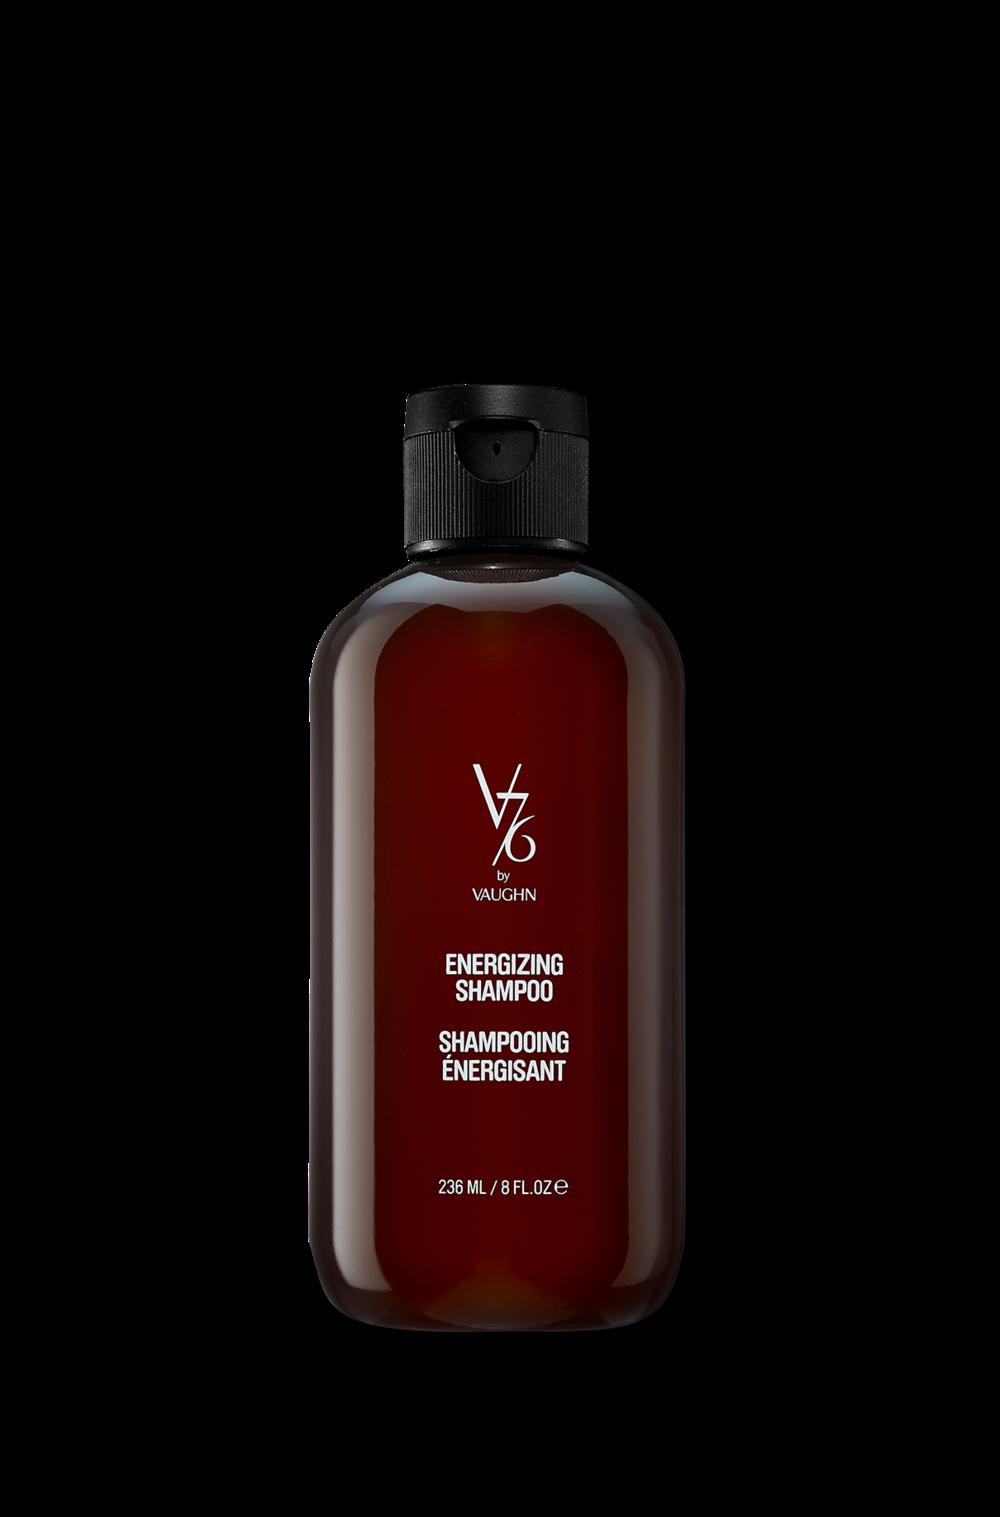 V76 by Vaughn  Energizing Shampoo, 8 oz. $19.00